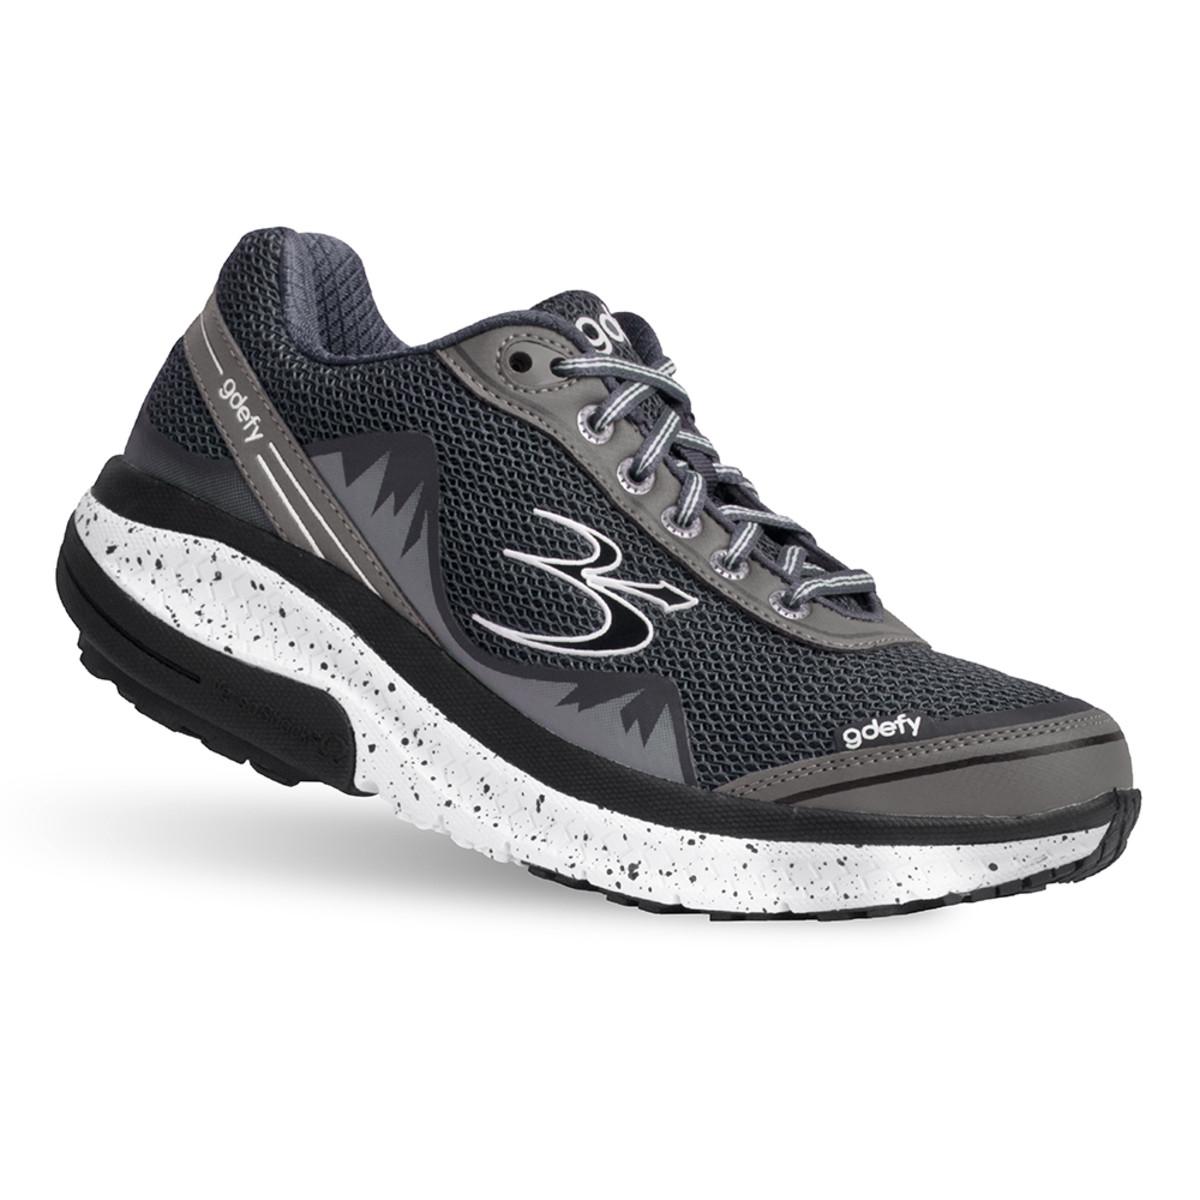 5d92d009b33 Men's G-Defy Mighty Walk Athletic Shoes – ComfortShoesReportCard